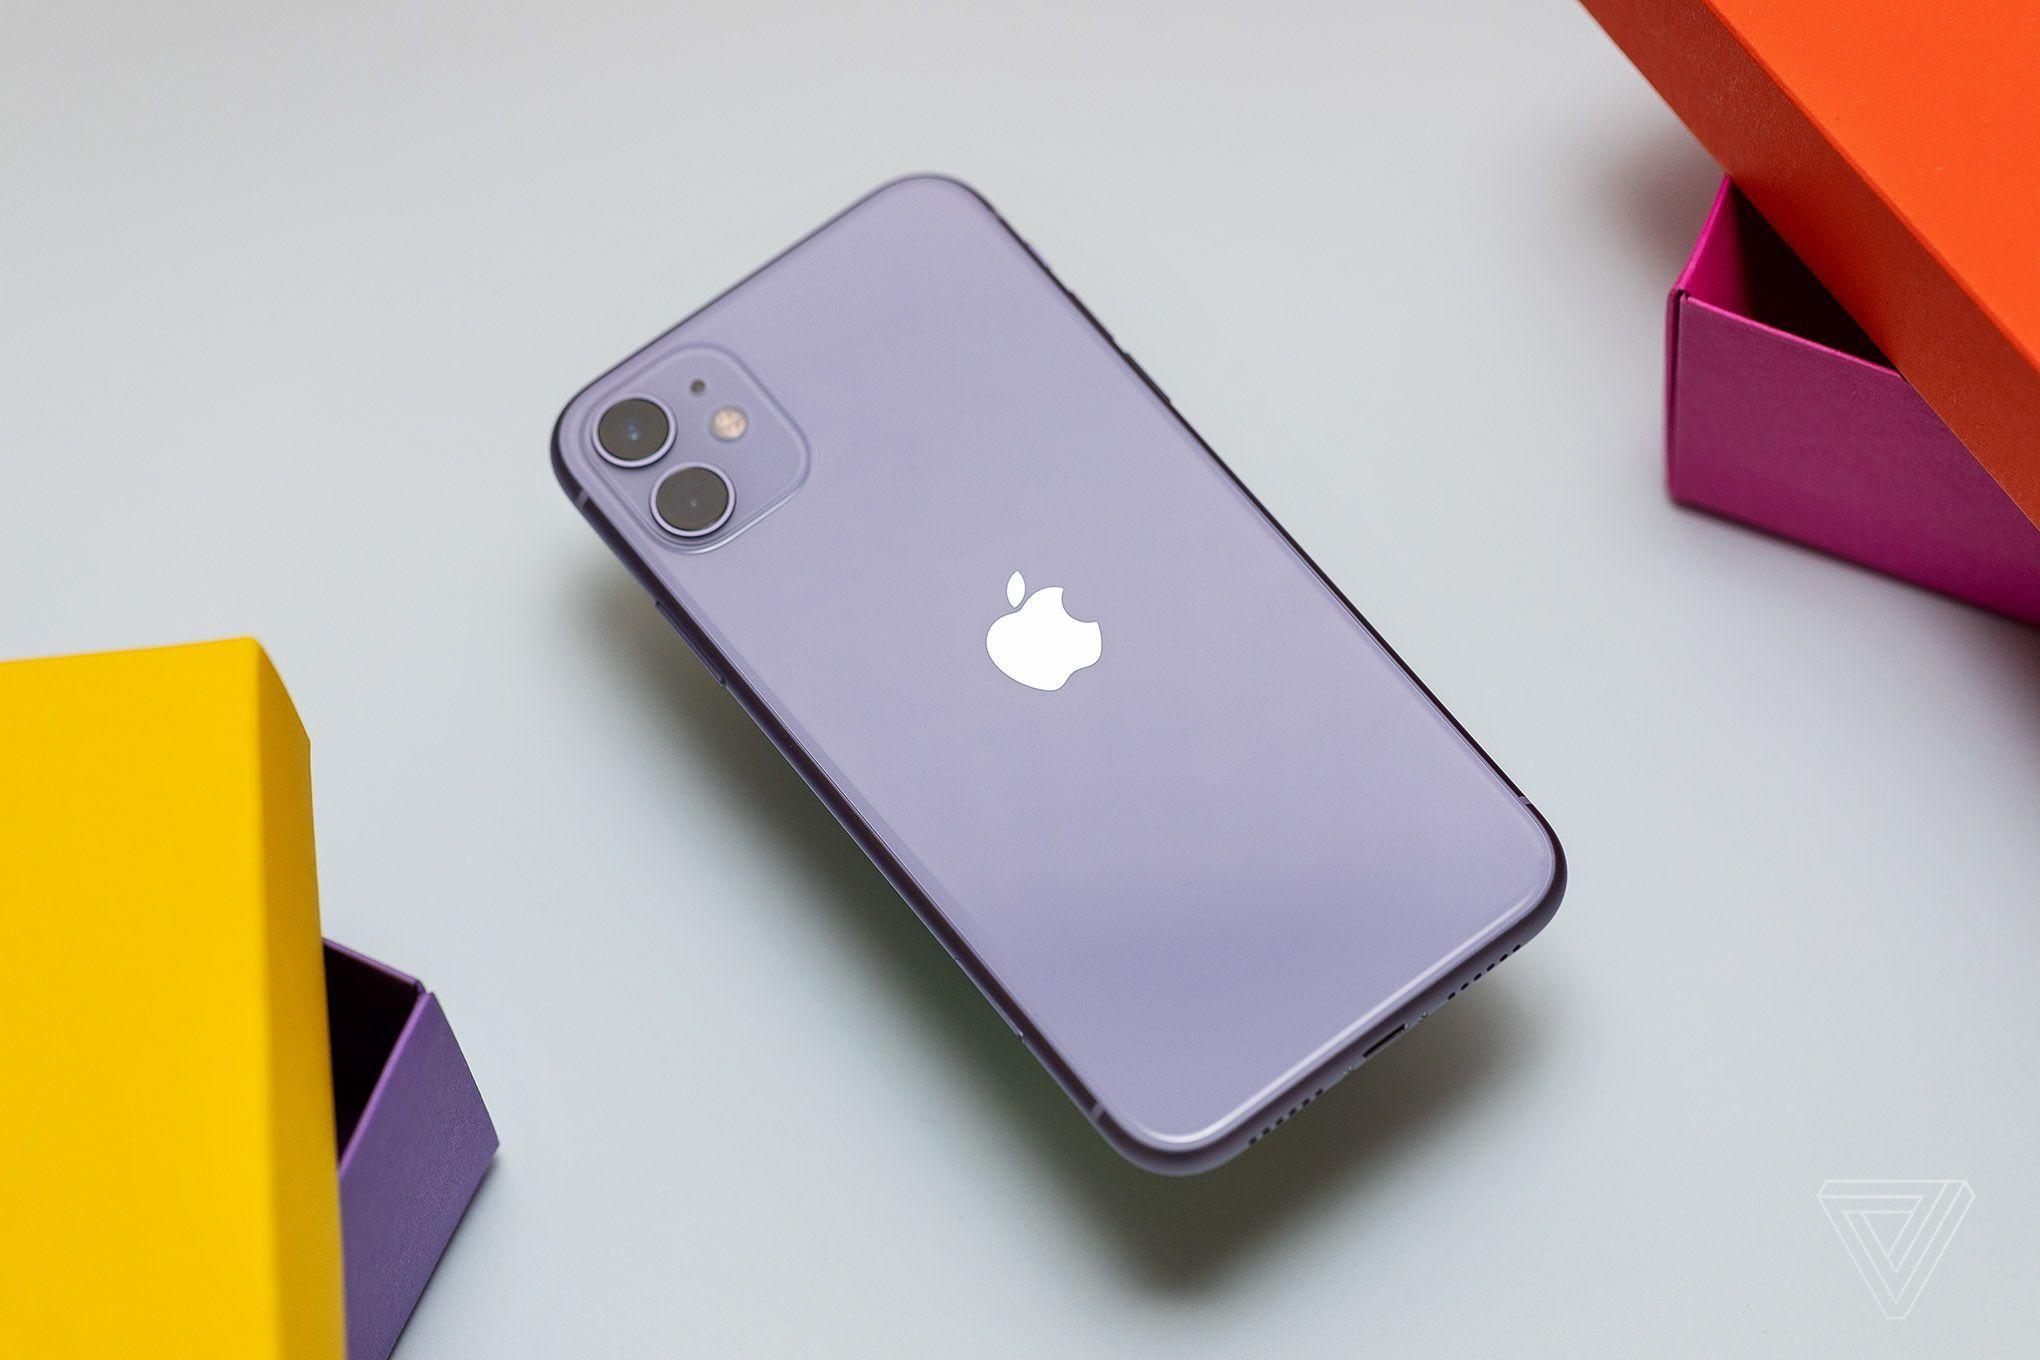 افضل مراجعة للايفون 11 والايفون 11 برو والبرو ماكس Iphone Iphone Upgrade Iphone Trade In